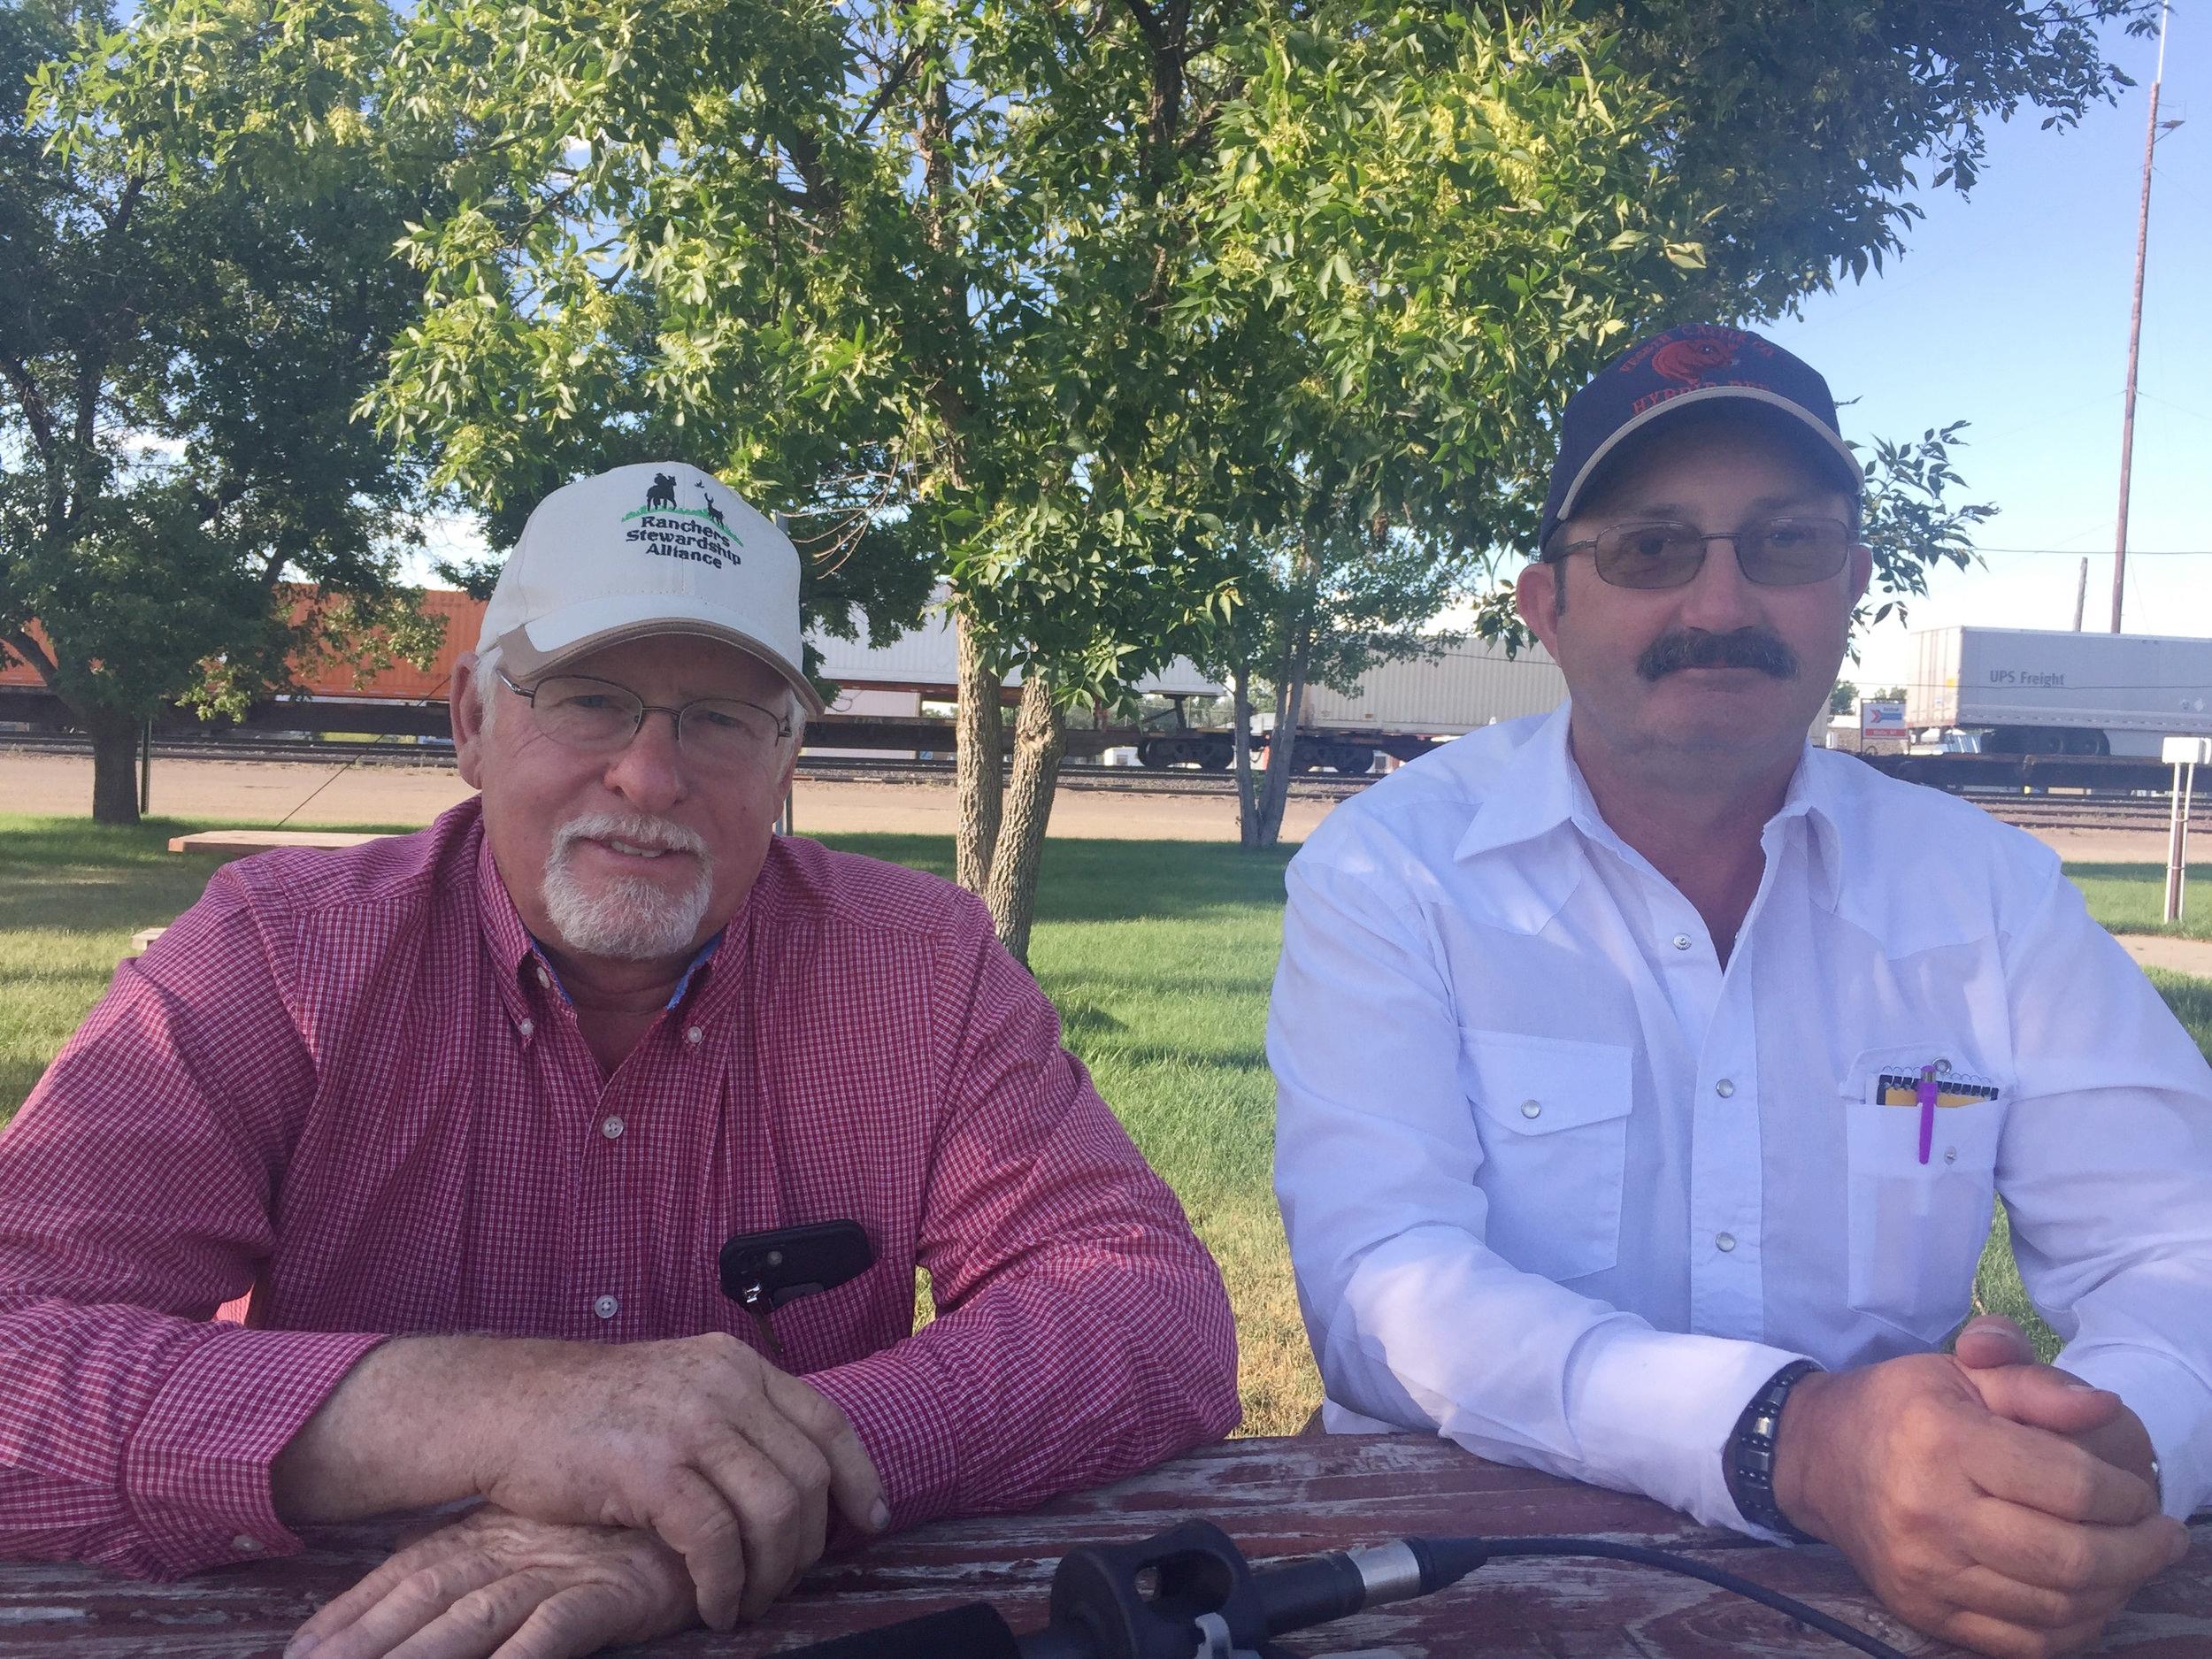 Leo Barthelmess and Dale Veseth, ranchers